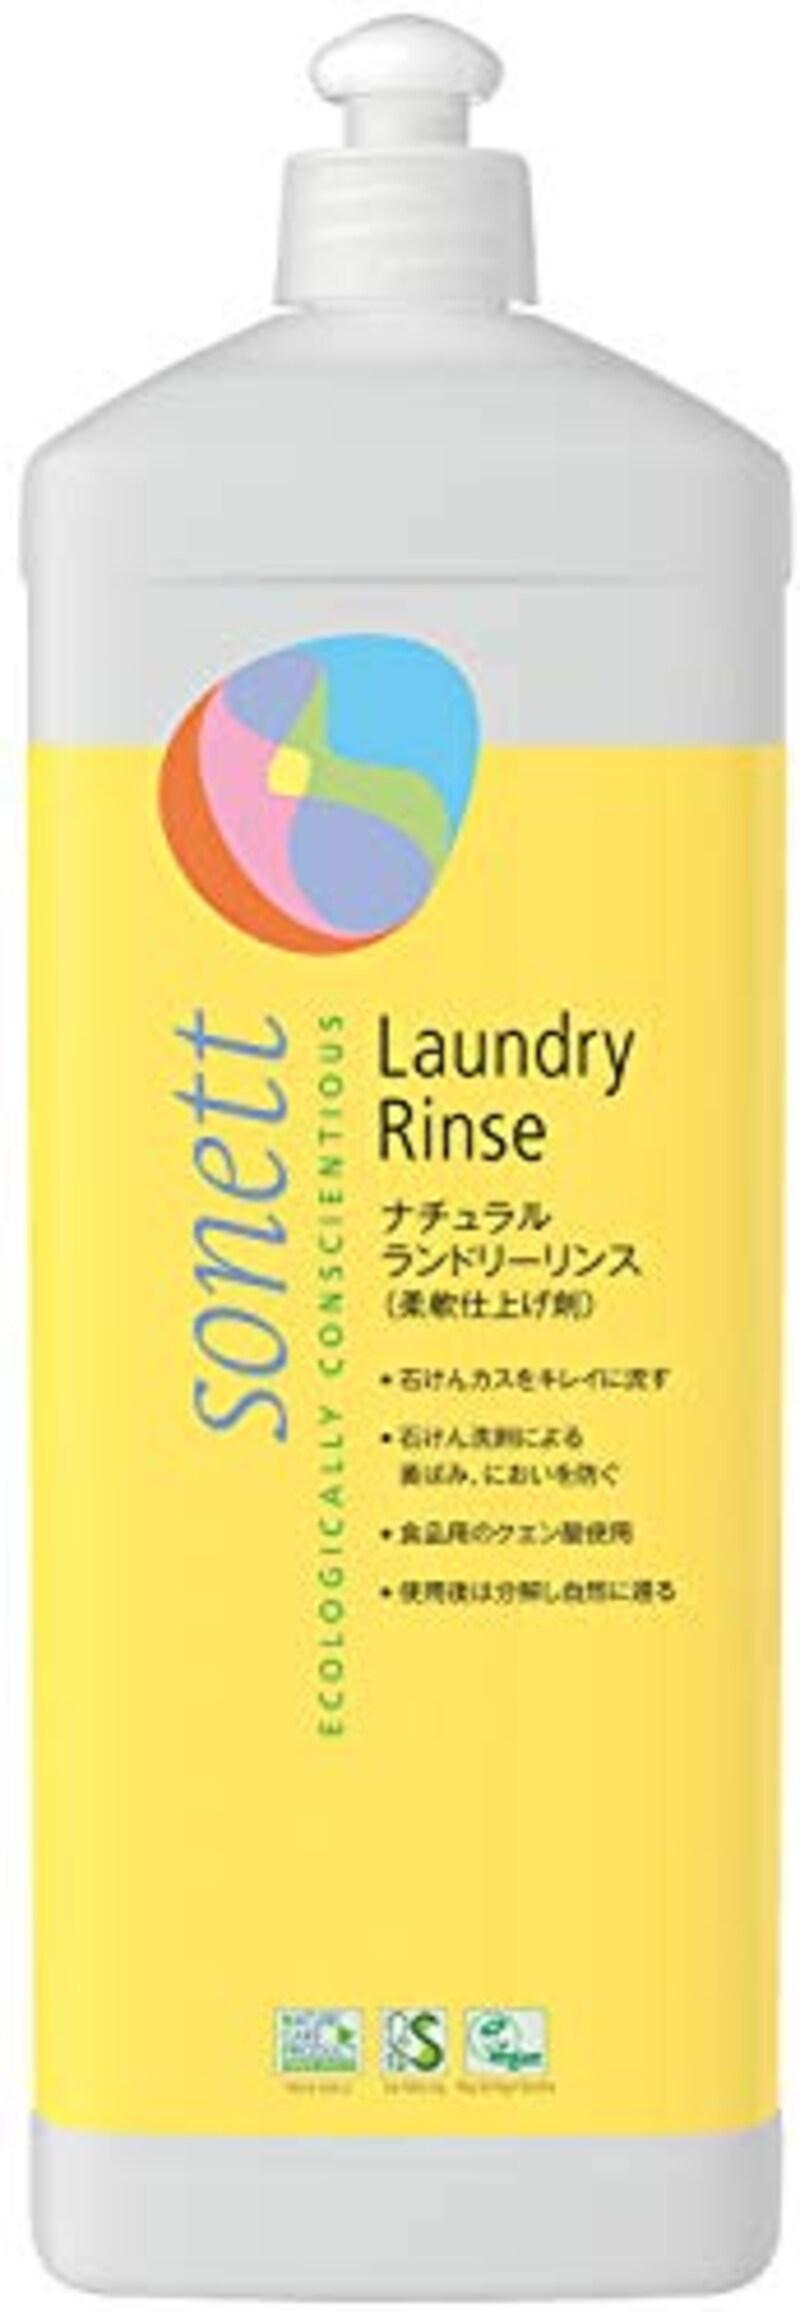 SONETT(ソネット),柔軟剤 すすぎ仕上げ用